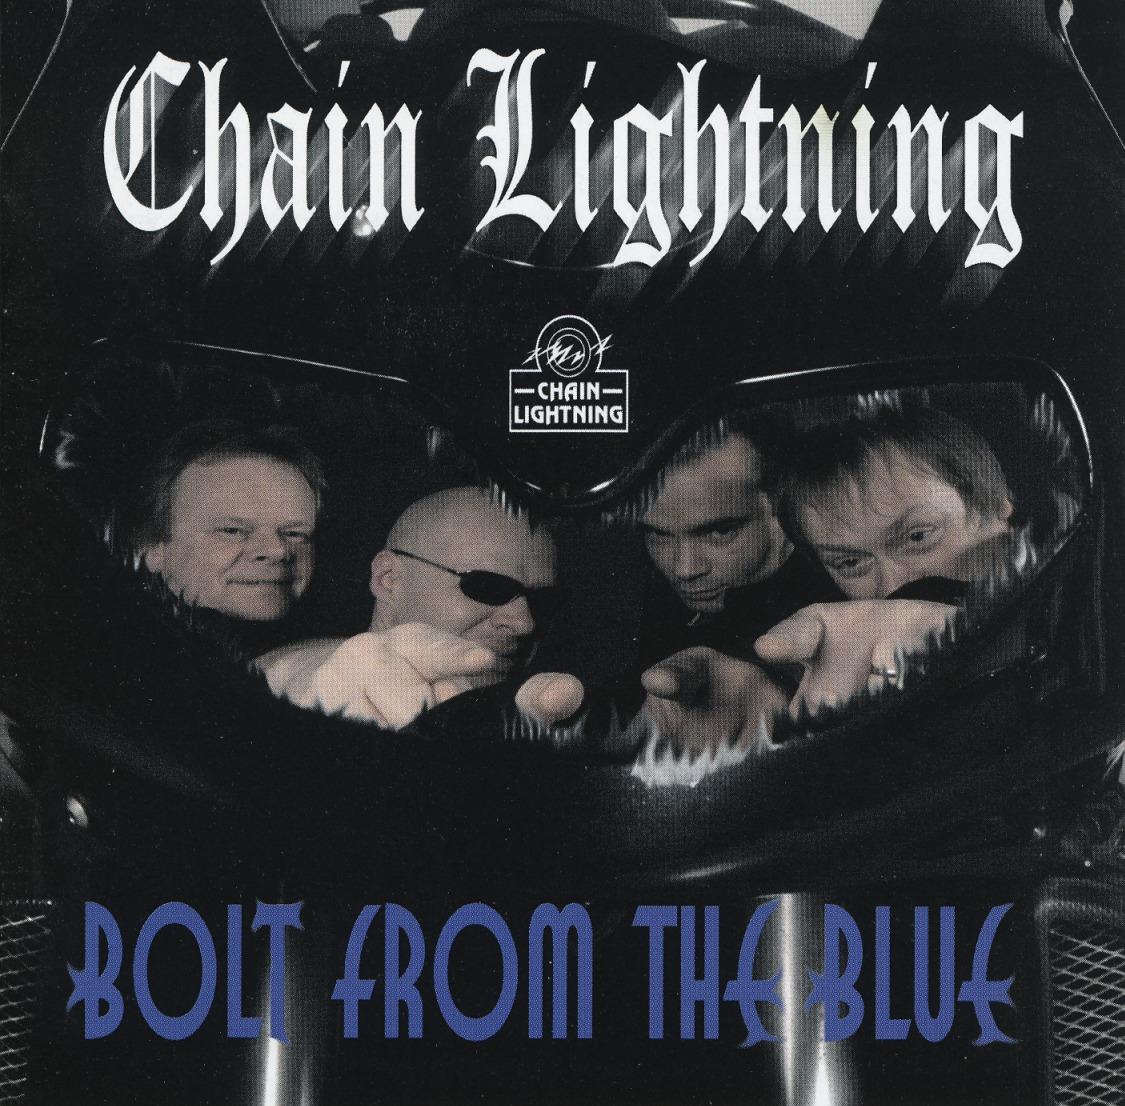 CHAIN LIGHTNING (UK) / Bolt From The Blue